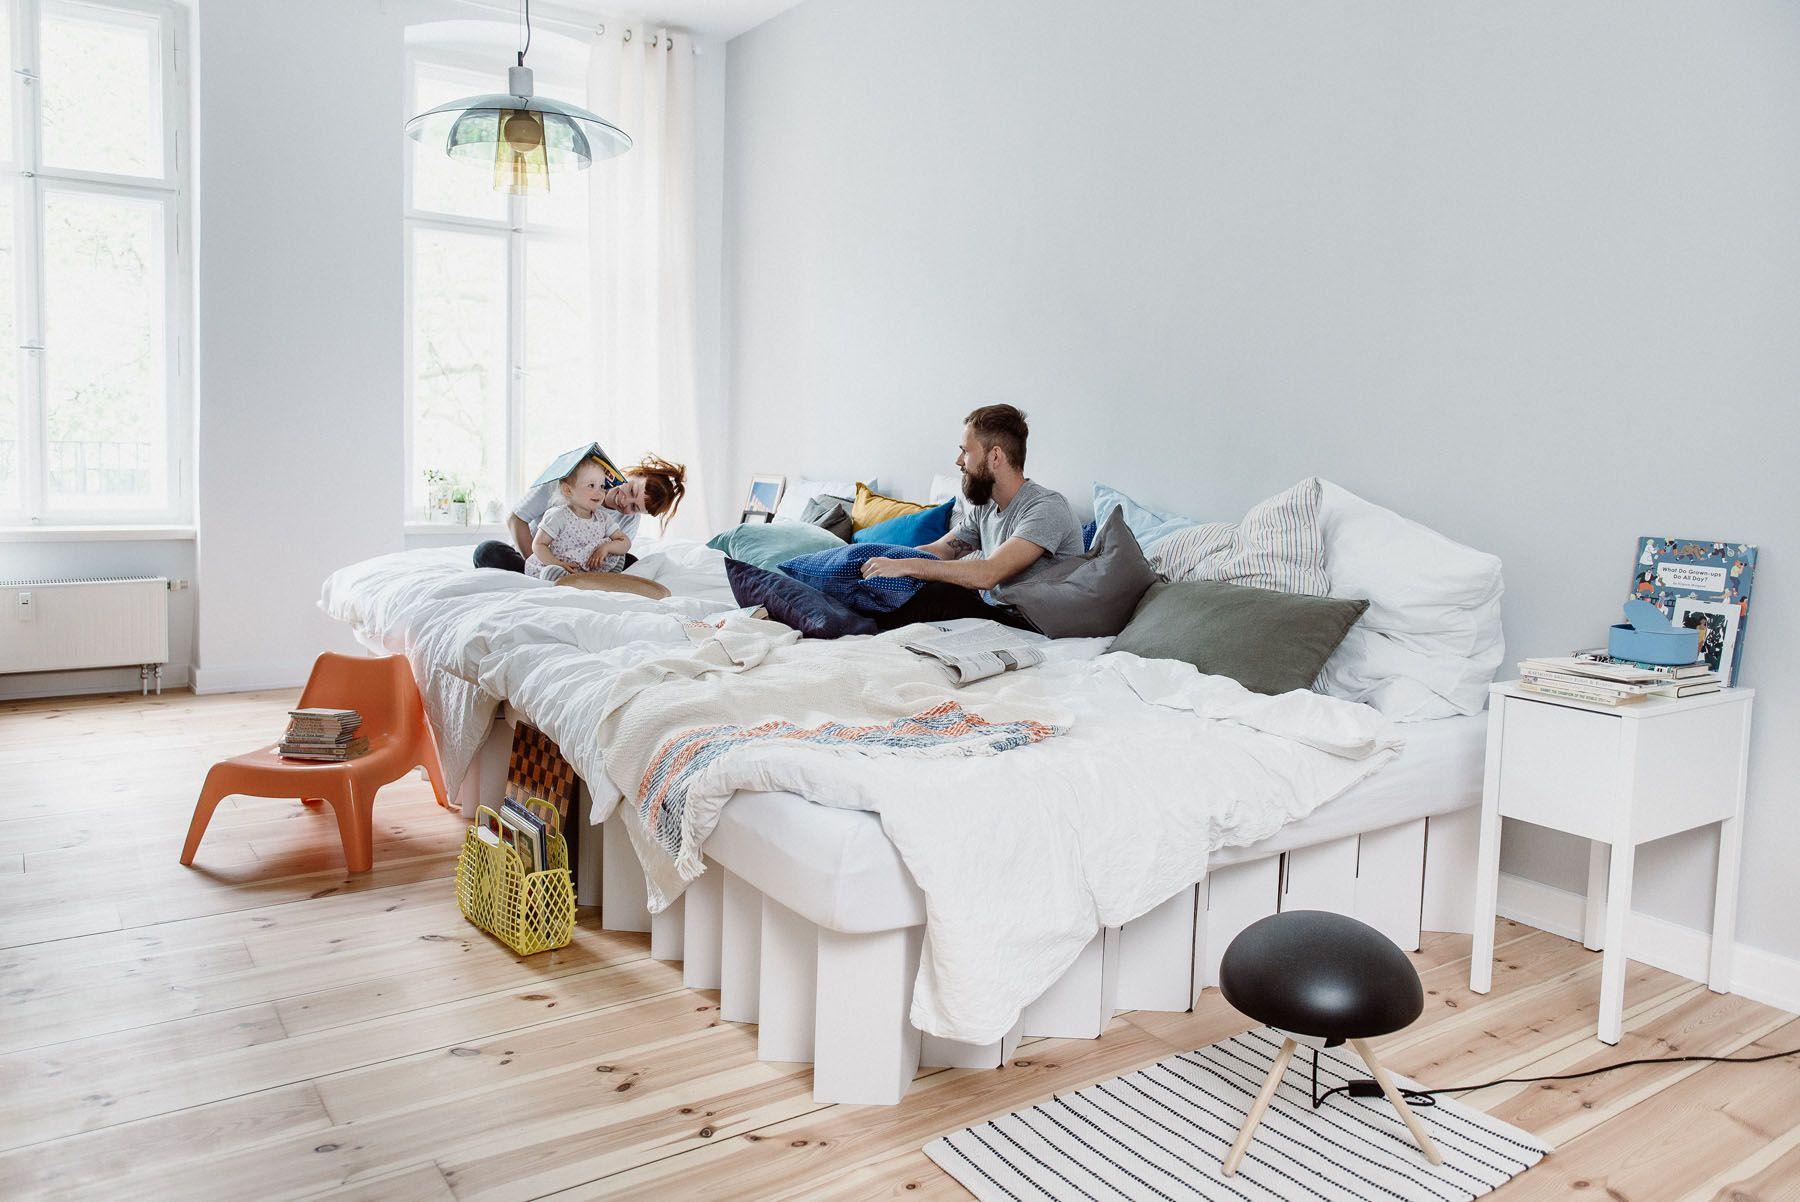 Familienbett Familienbett Familien Bett Flexible Mobel